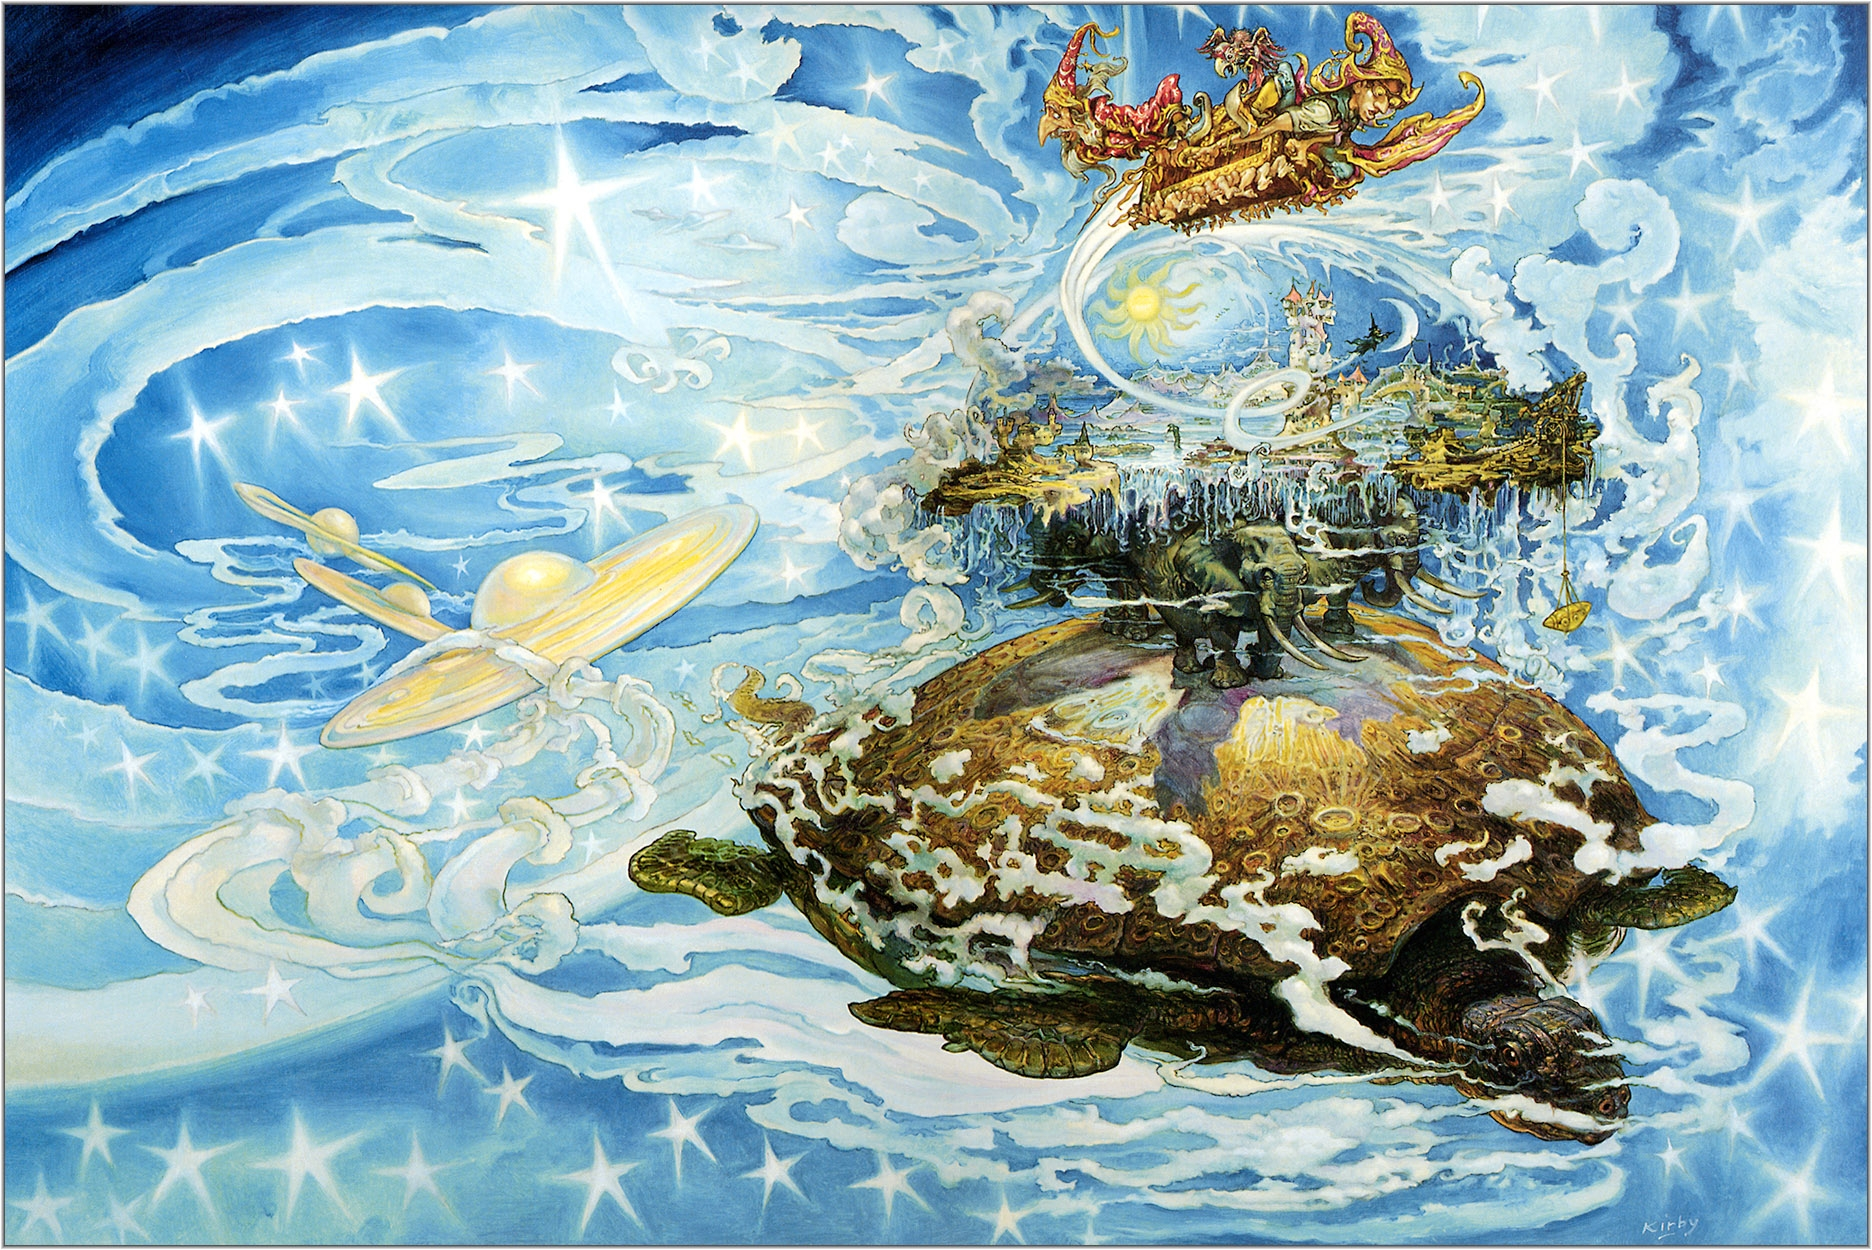 turtles discworld terry pratchett drawings 1872x1250 wallpaper 1872x1250